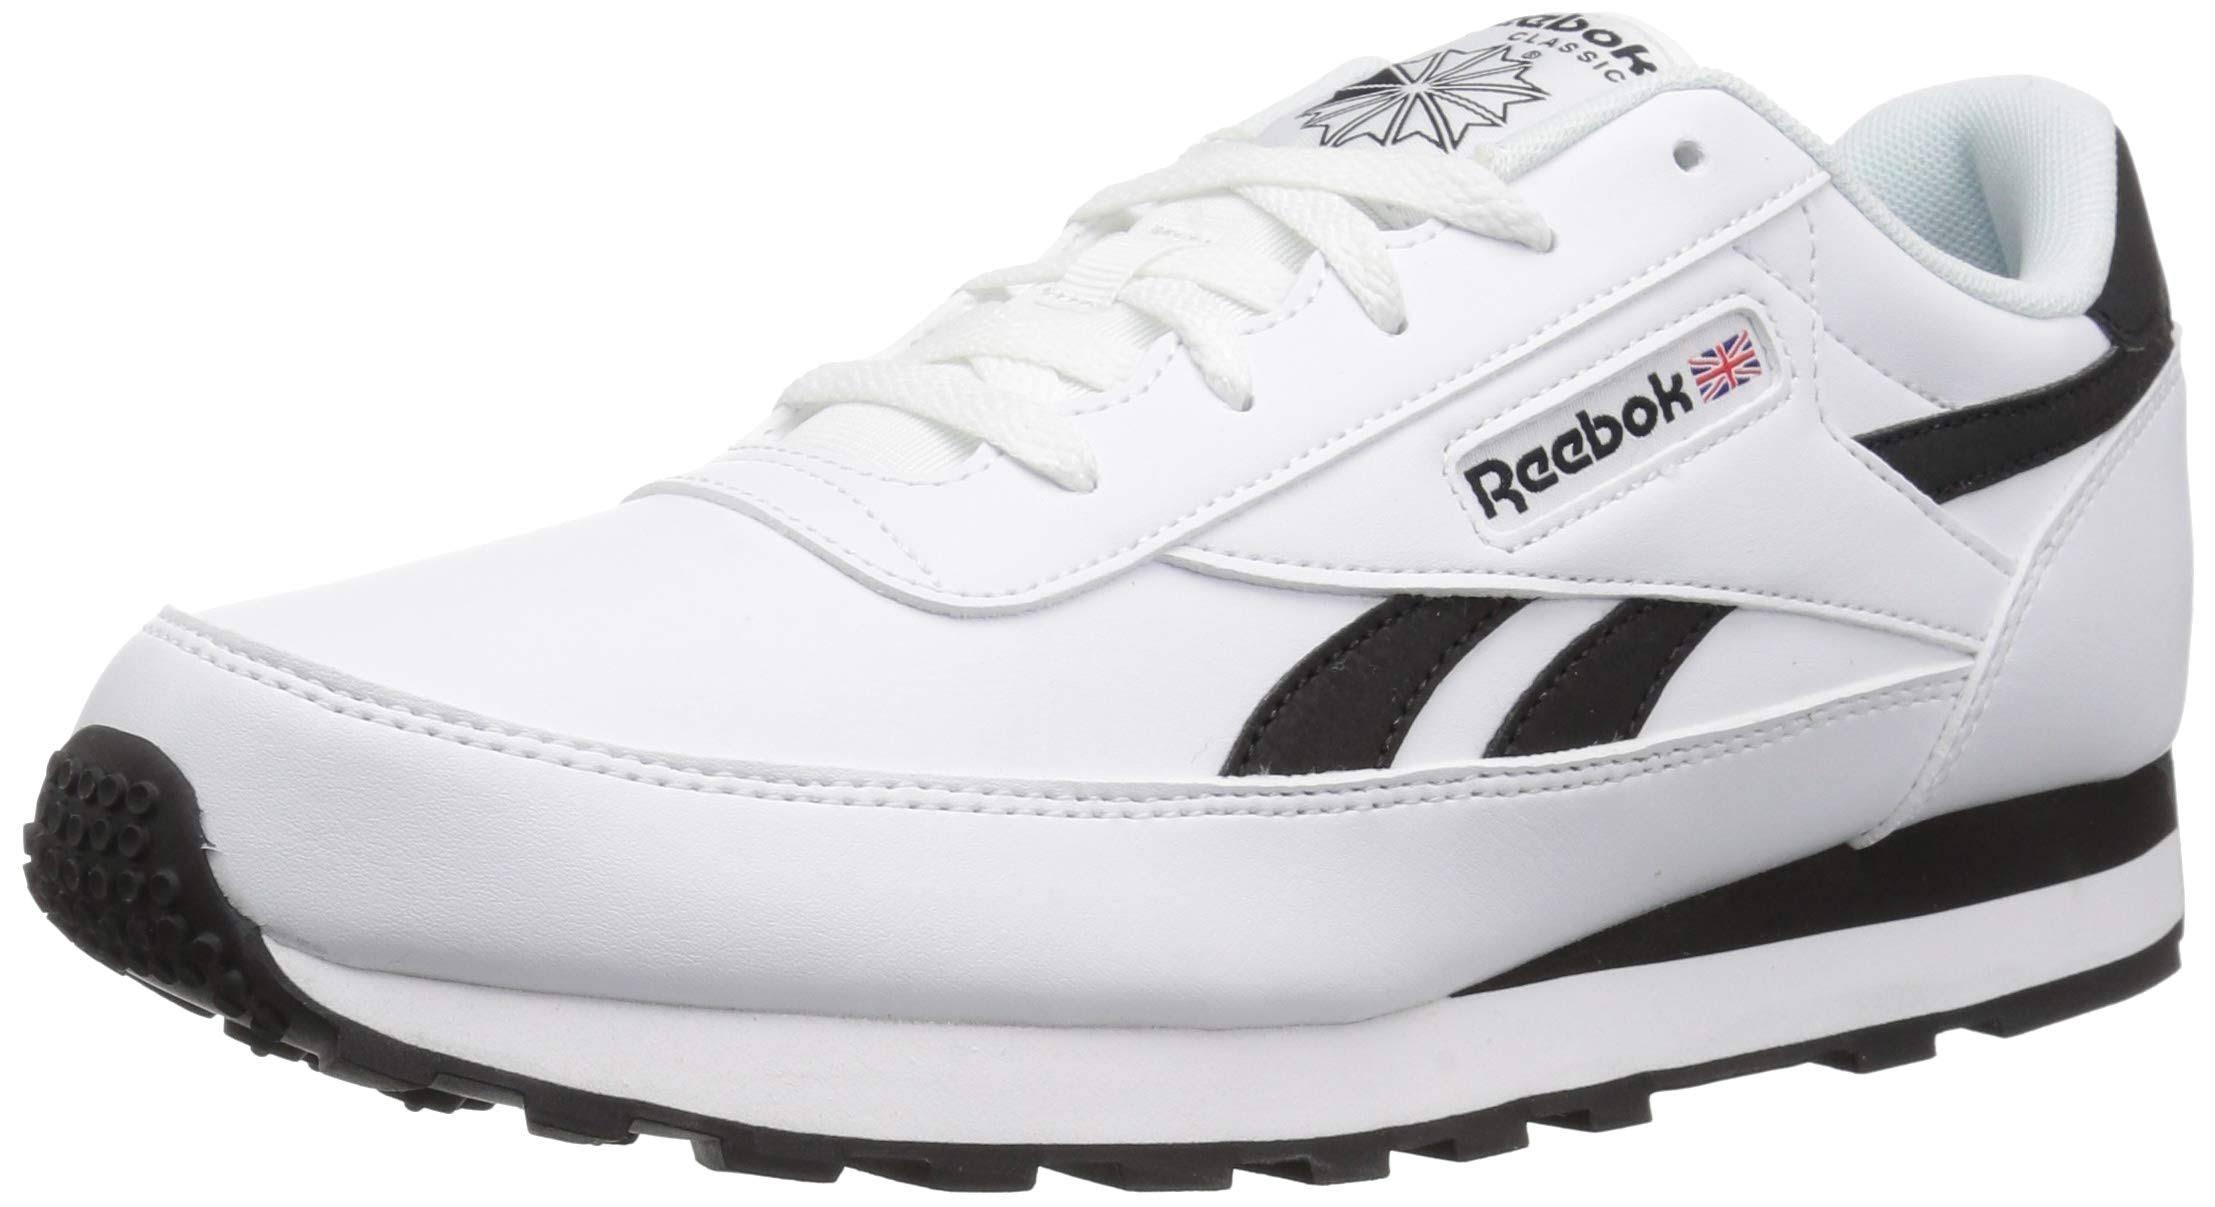 6 Sneaker Cl Hombres Blanco Renaissance Negro Reebok 7gRvqYx